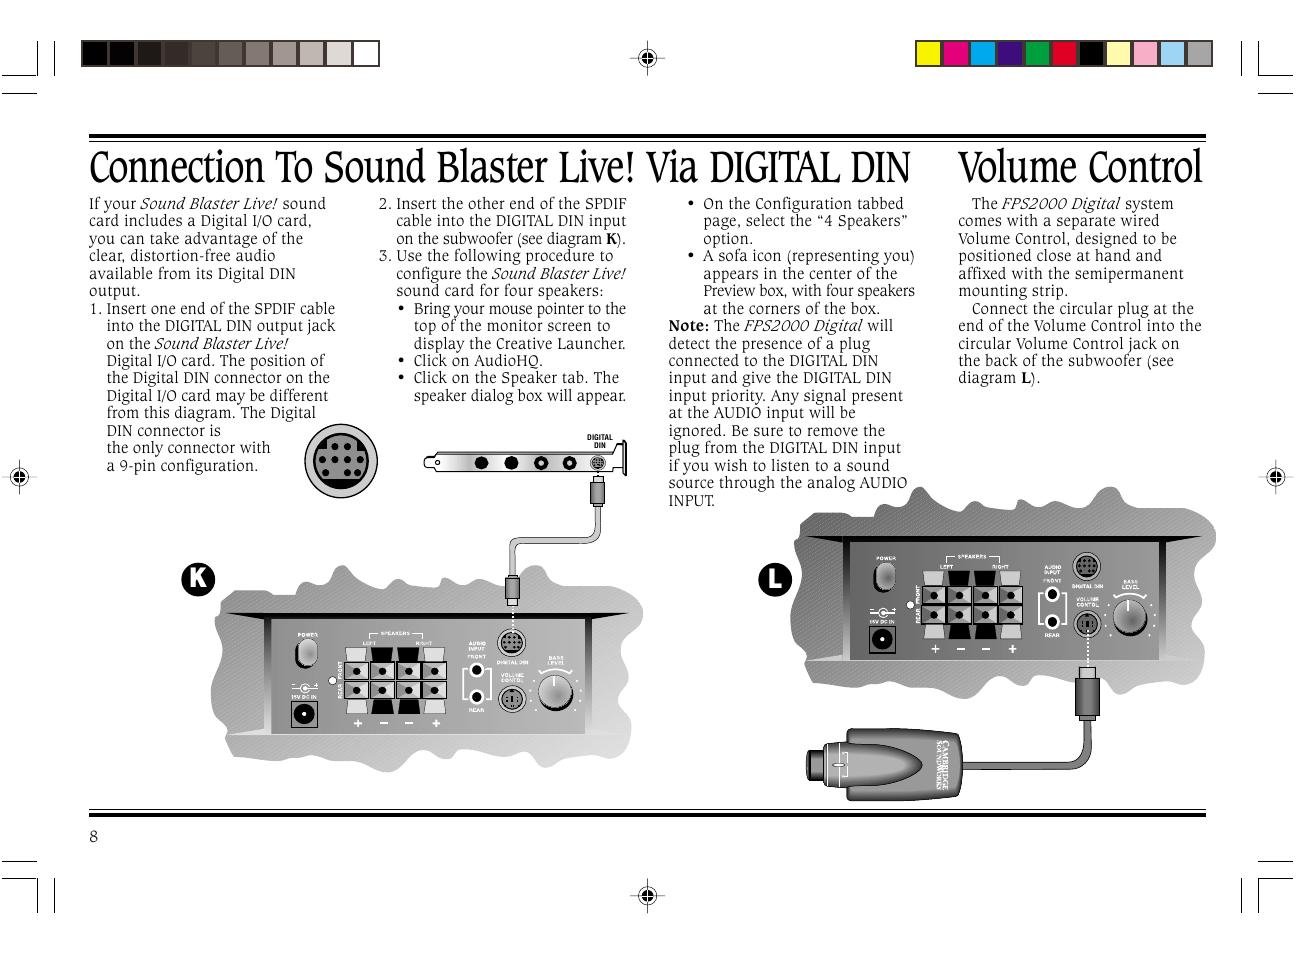 Cambridge Soundworks Subwoofer Wiring Diagram Live Sound Volume Control Connection To Blaster Via Digital Din Repair